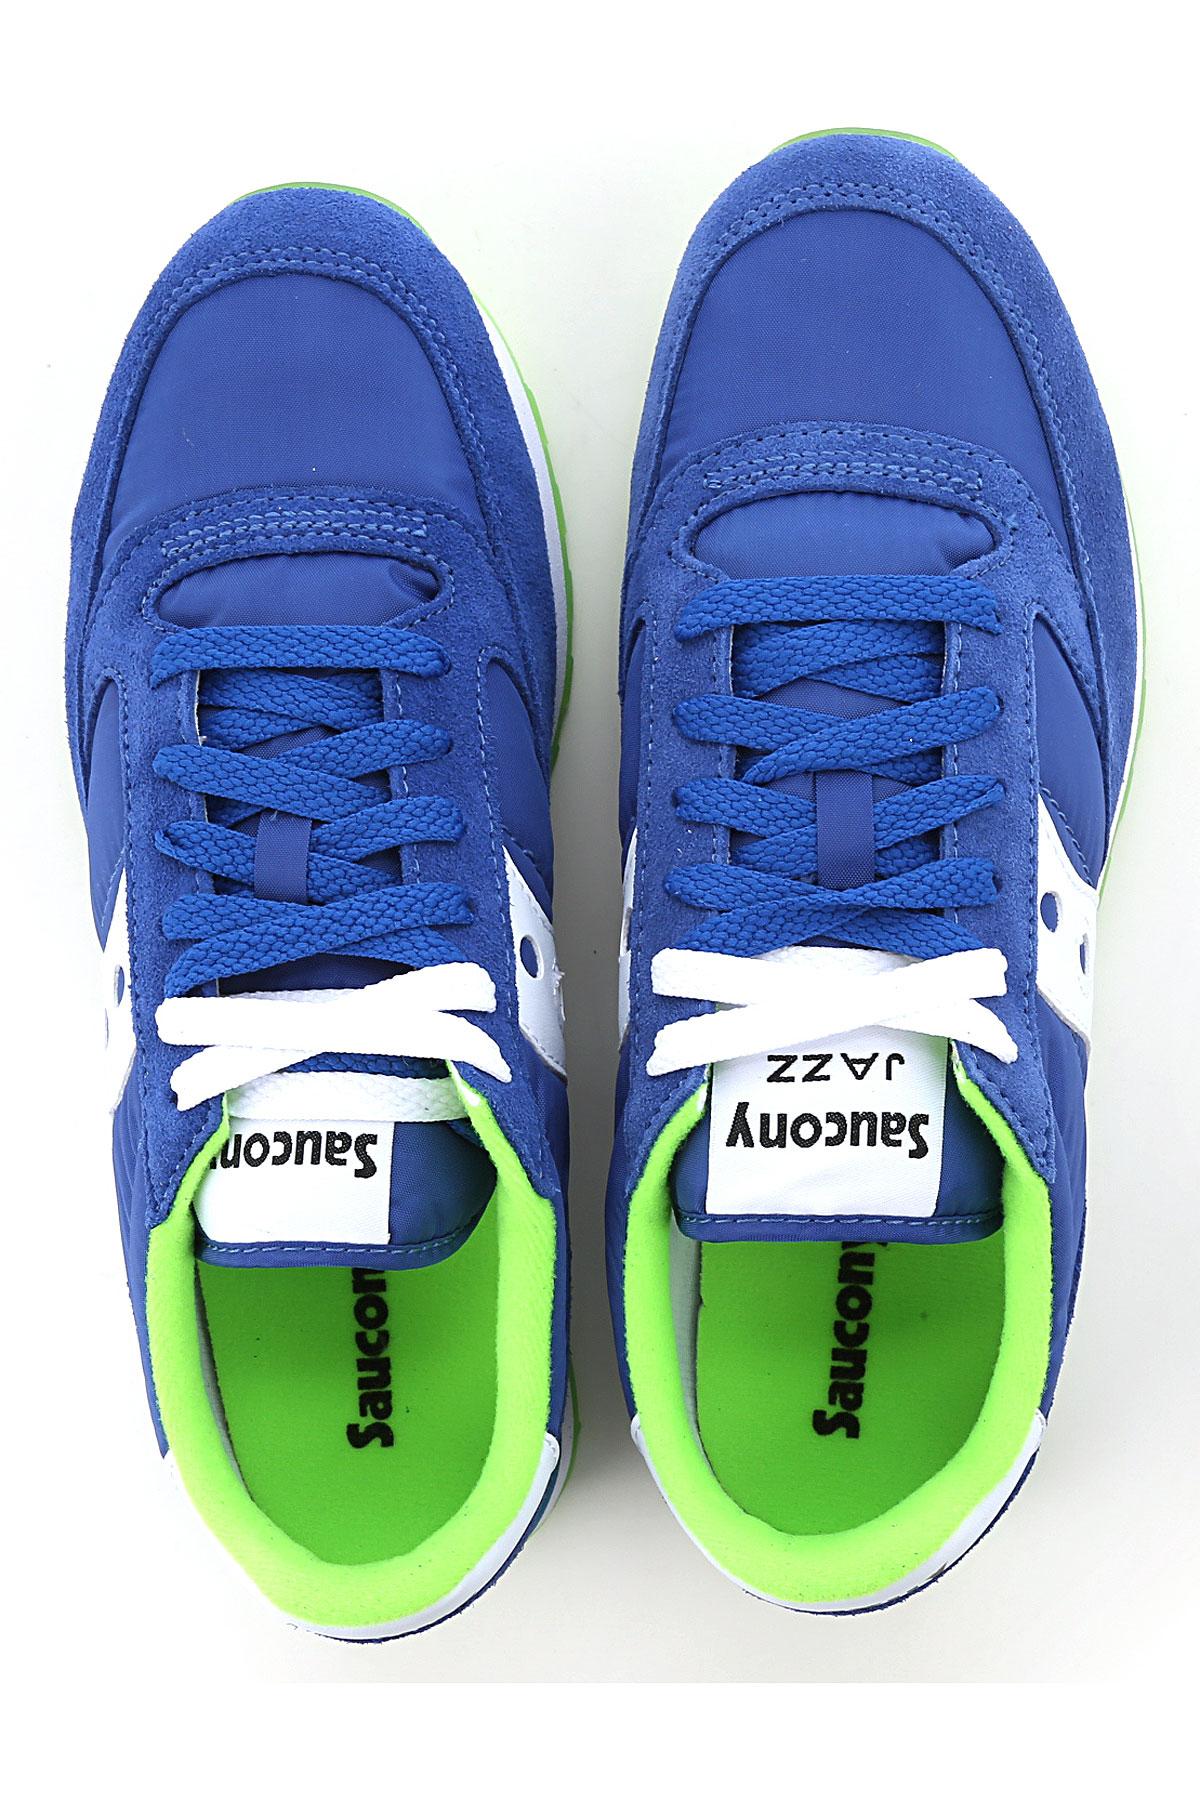 Fluorescente Primavera verano Verde Para 2019 Zapatos Saucony Bluette Hombres pqAwB8O